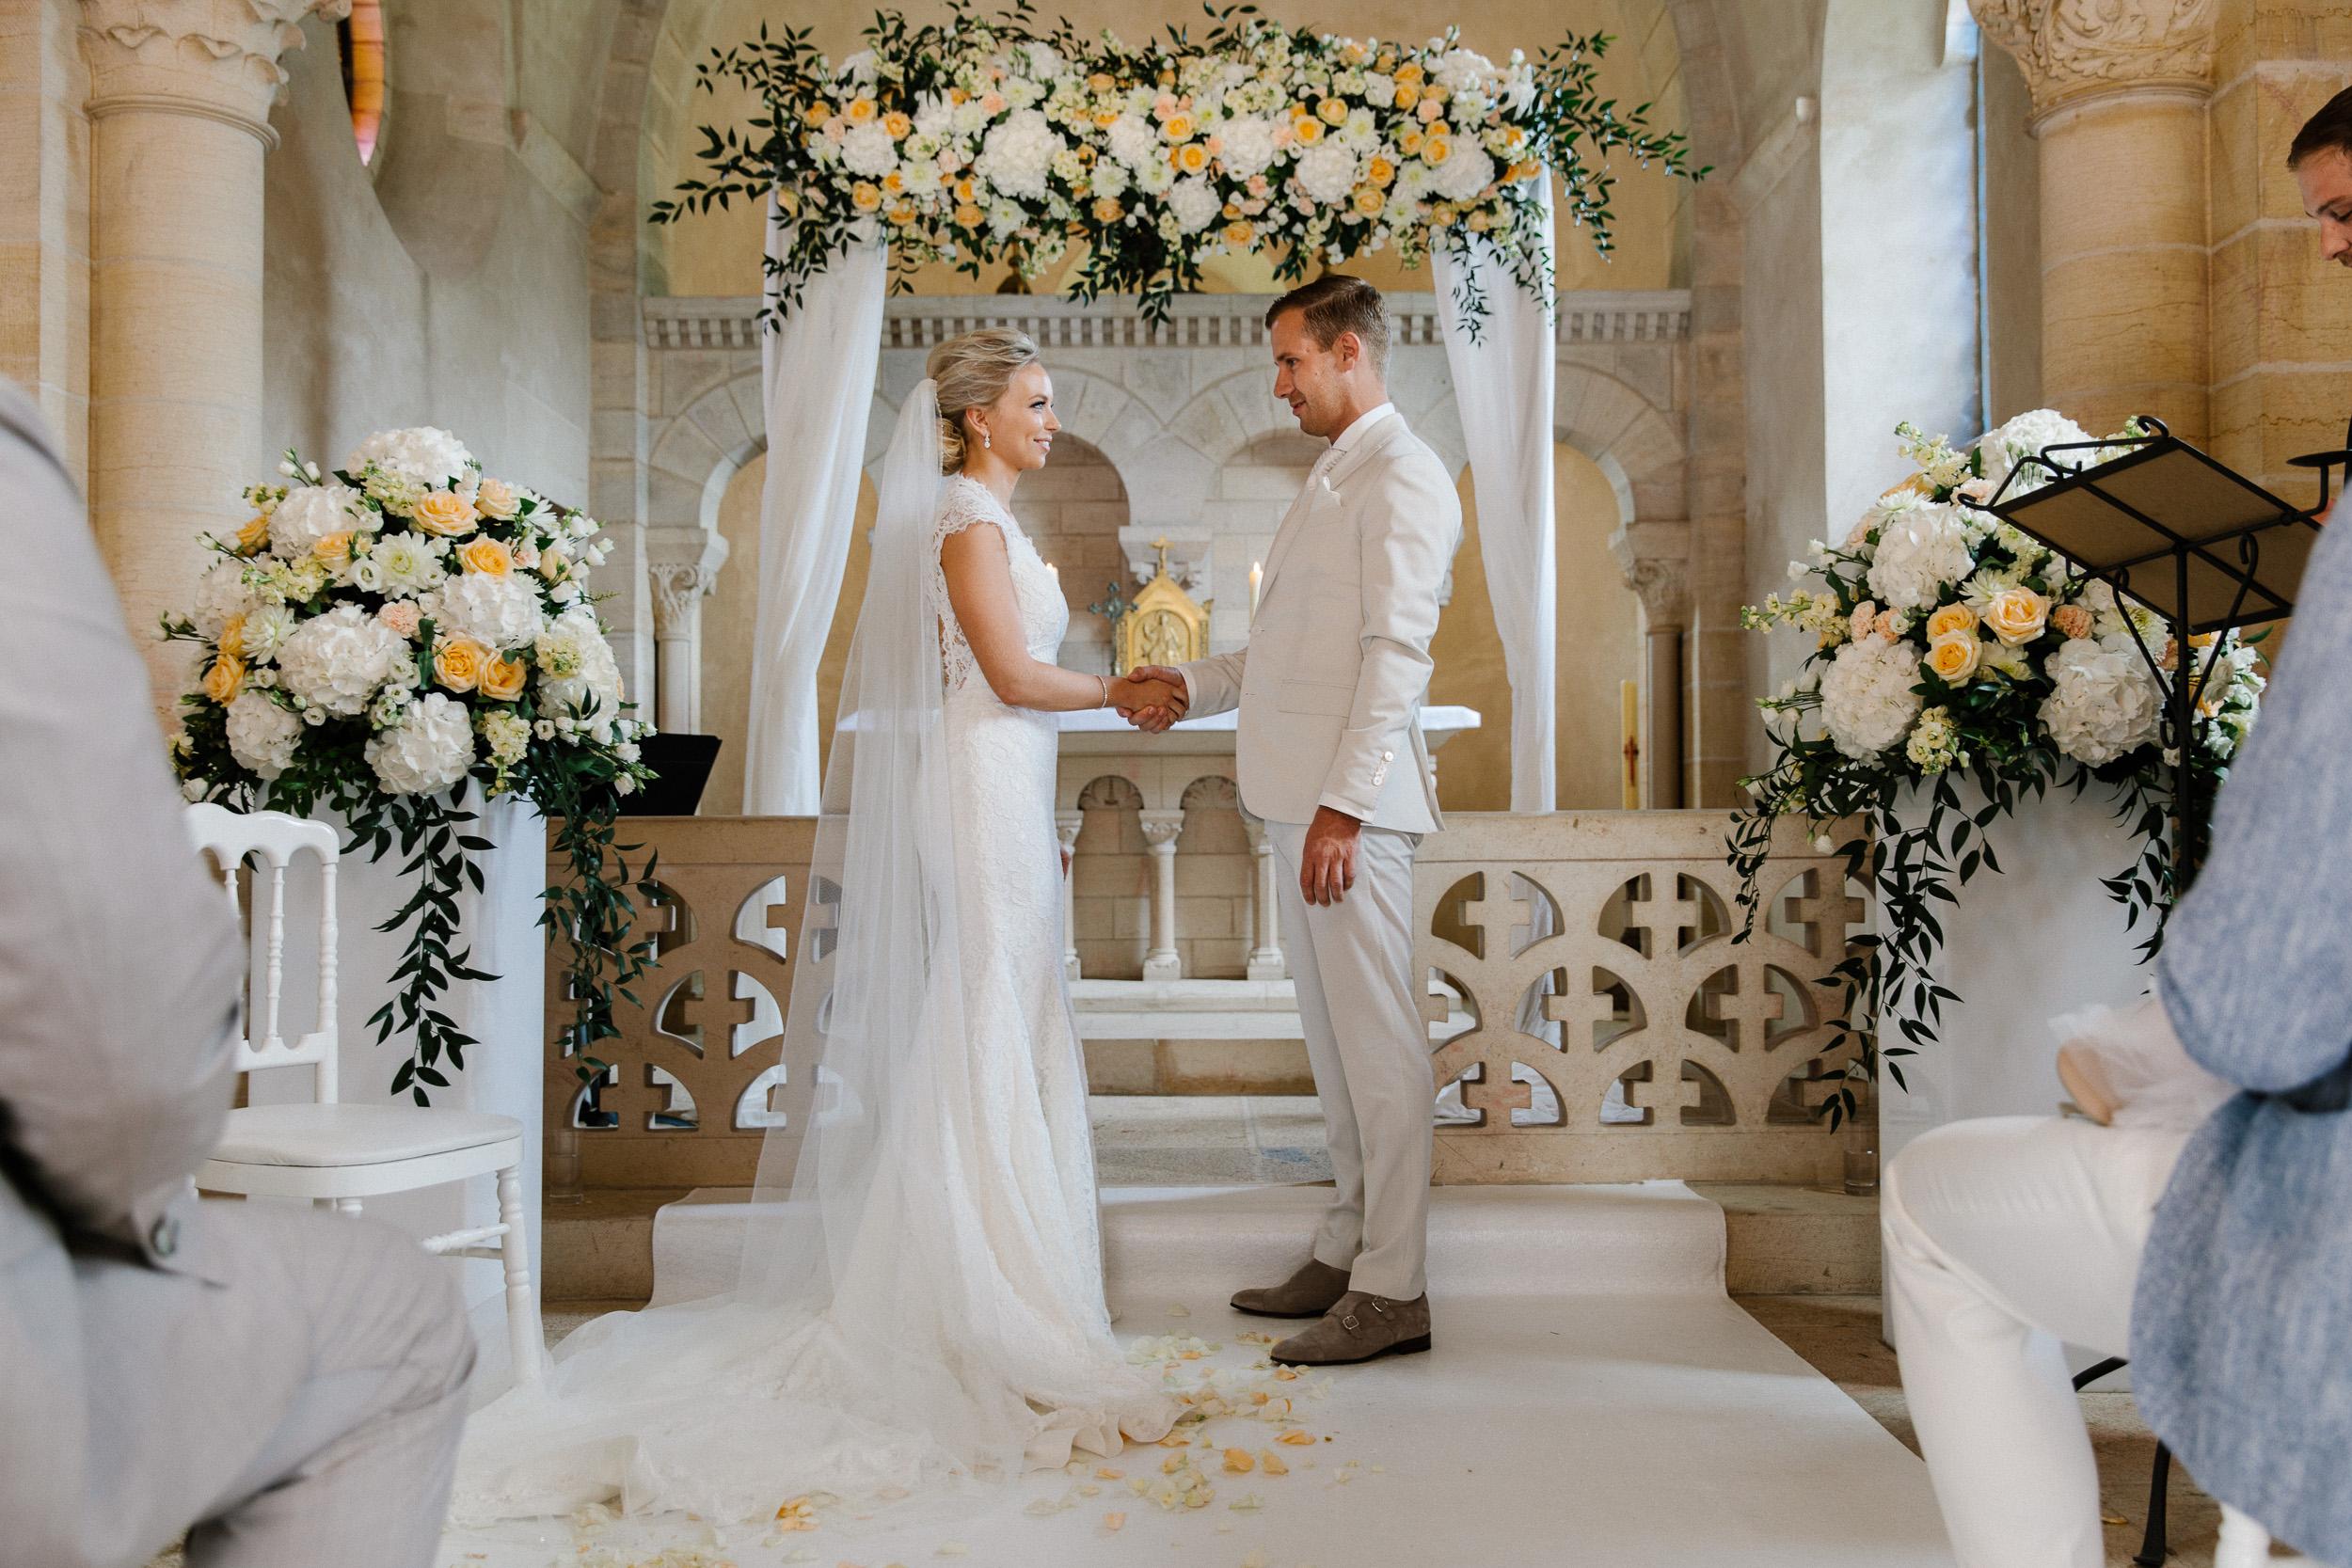 Wedding-Chateau-de-Varennes-050.jpg